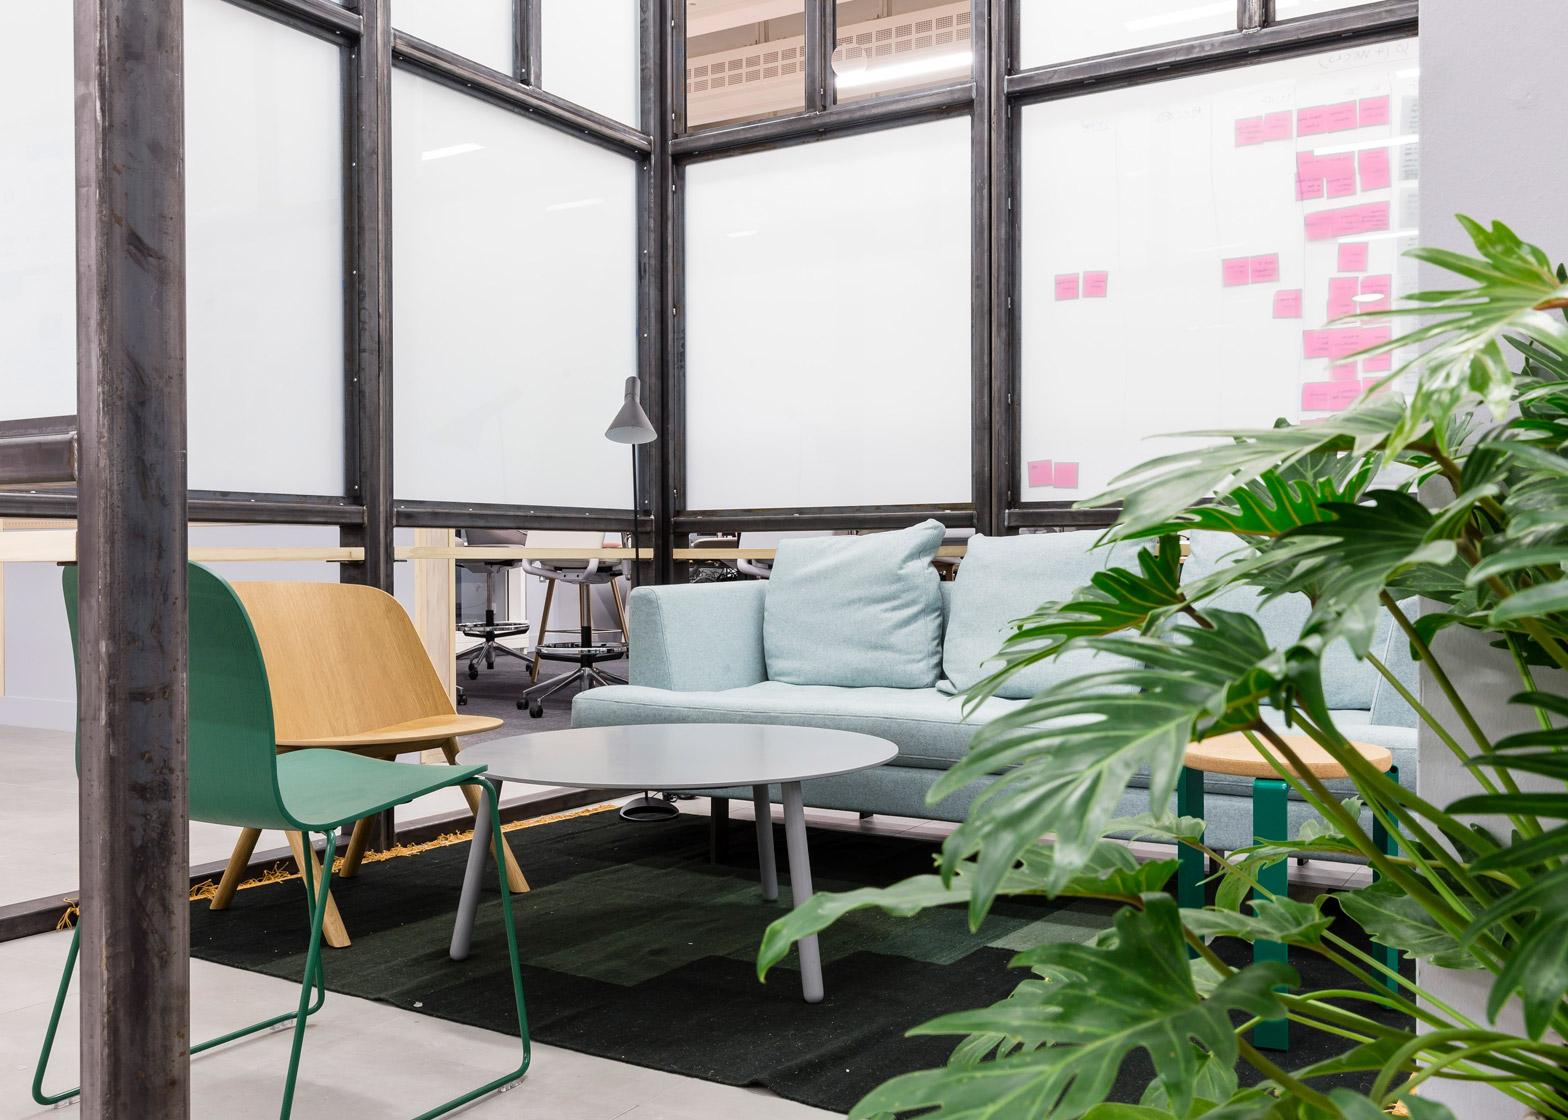 barclaycard-agile-workplace-APA-london-interior-design_dezeen_1568_6